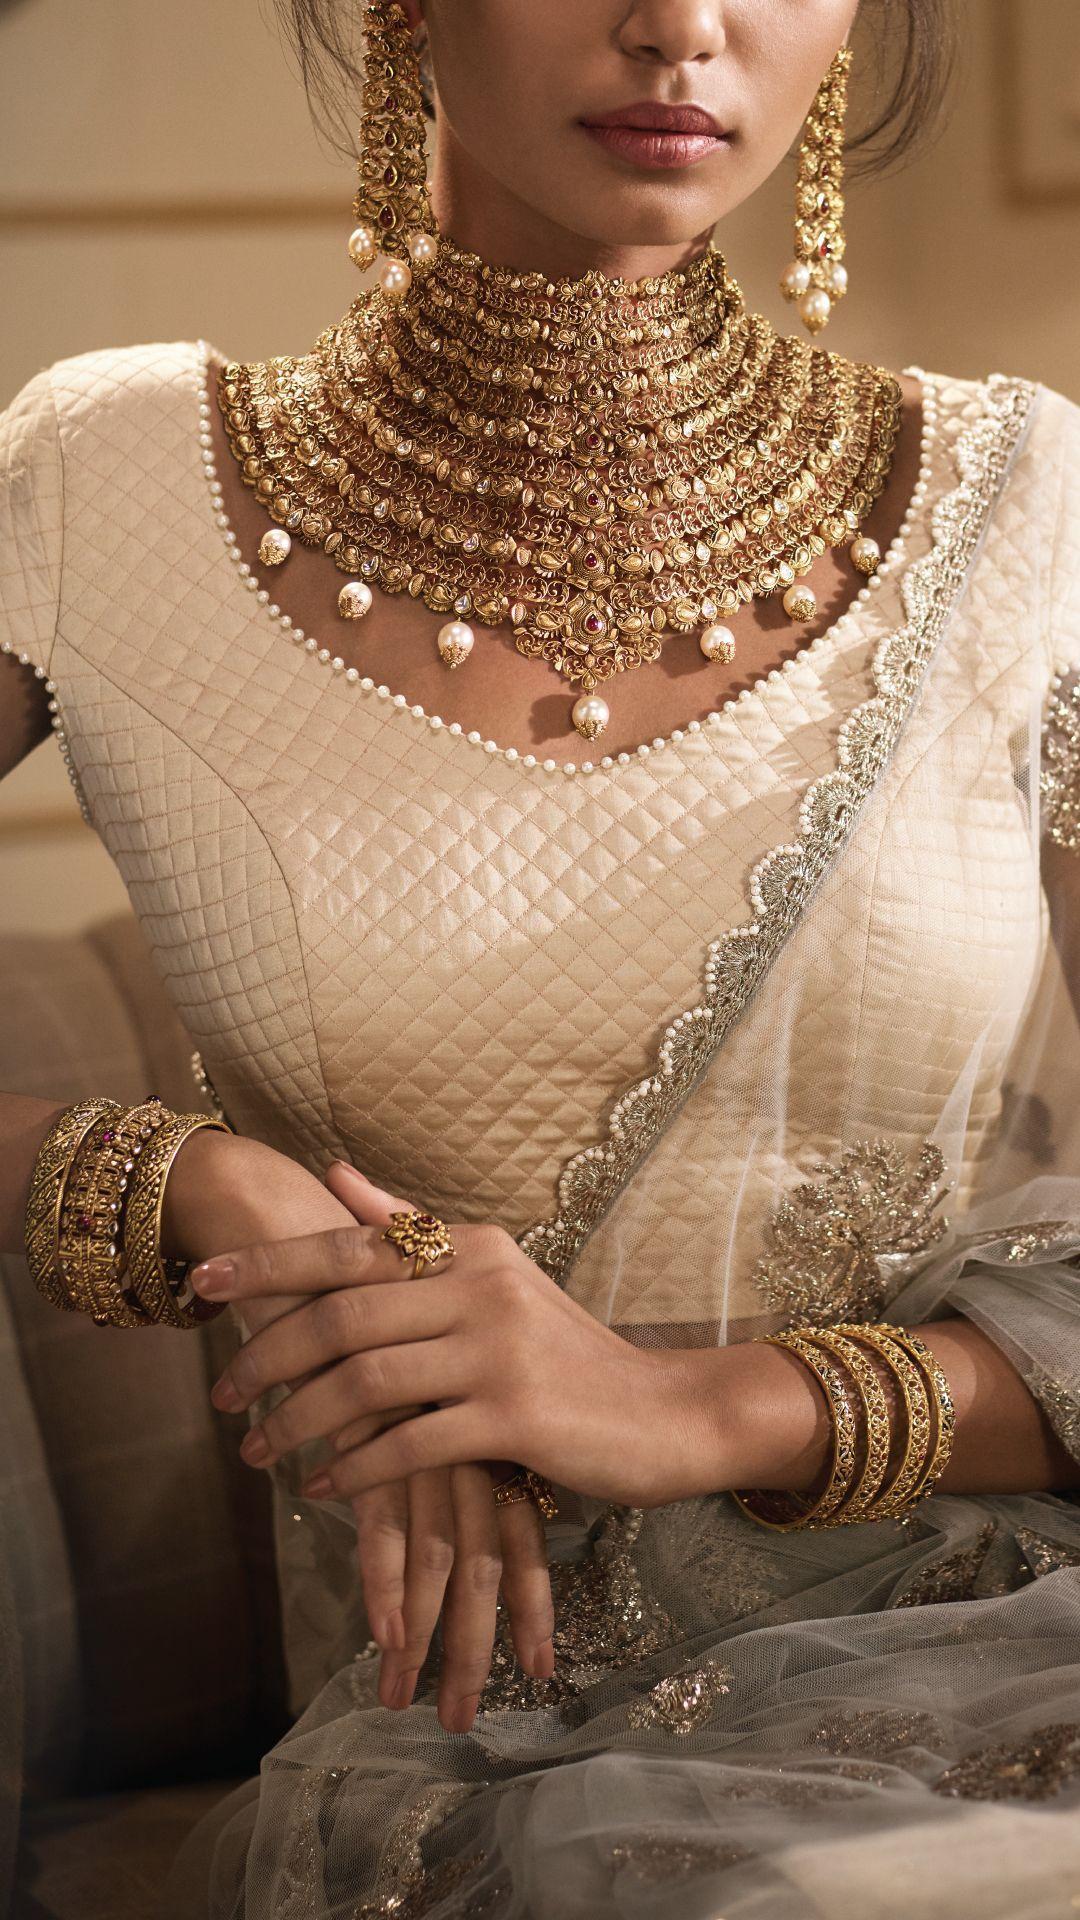 Types of wedding cakes for theme weddings gold jewellery luxury